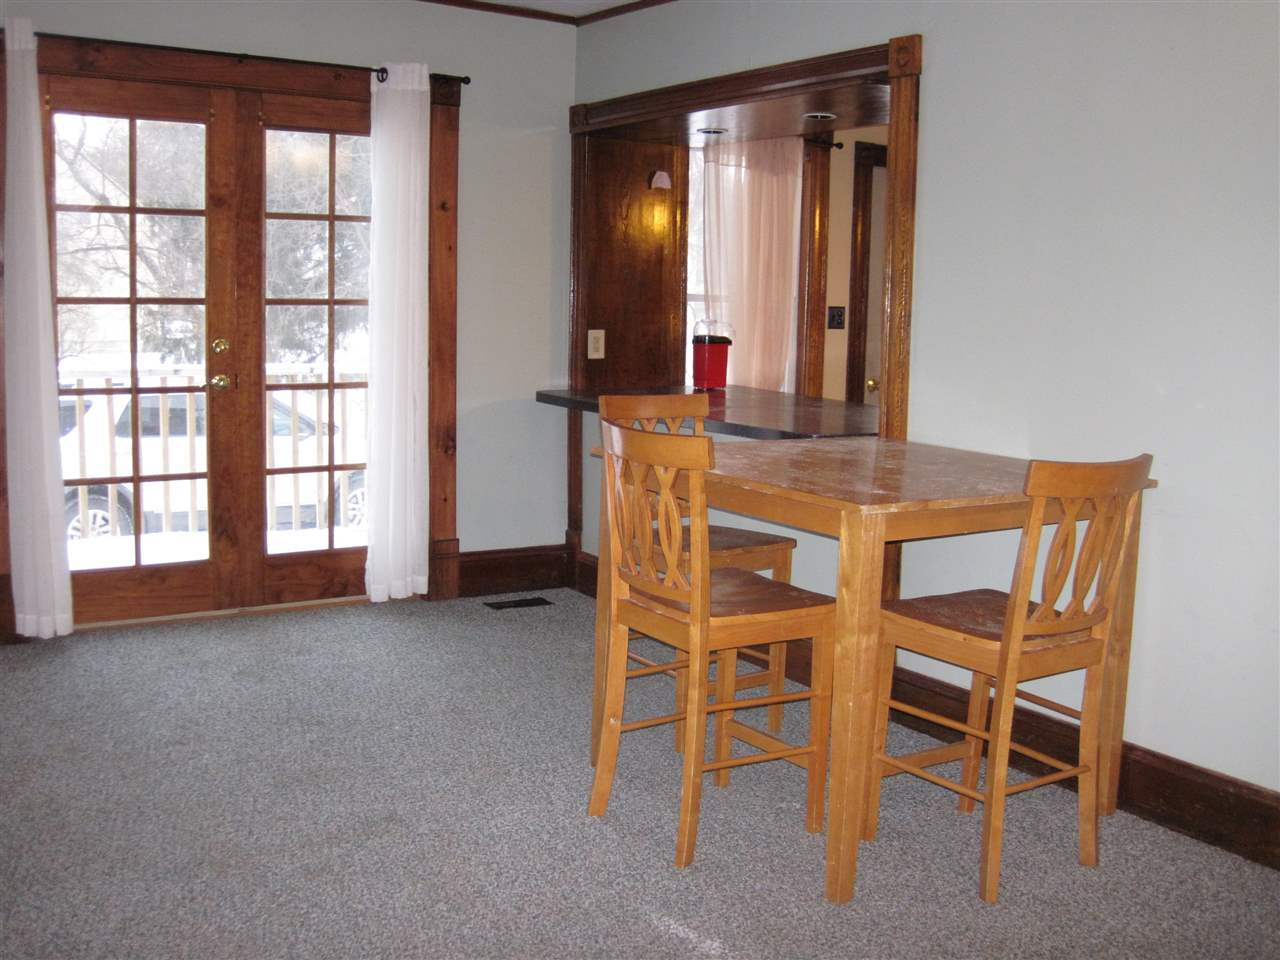 Vermont-Real-Estate-4611920-2